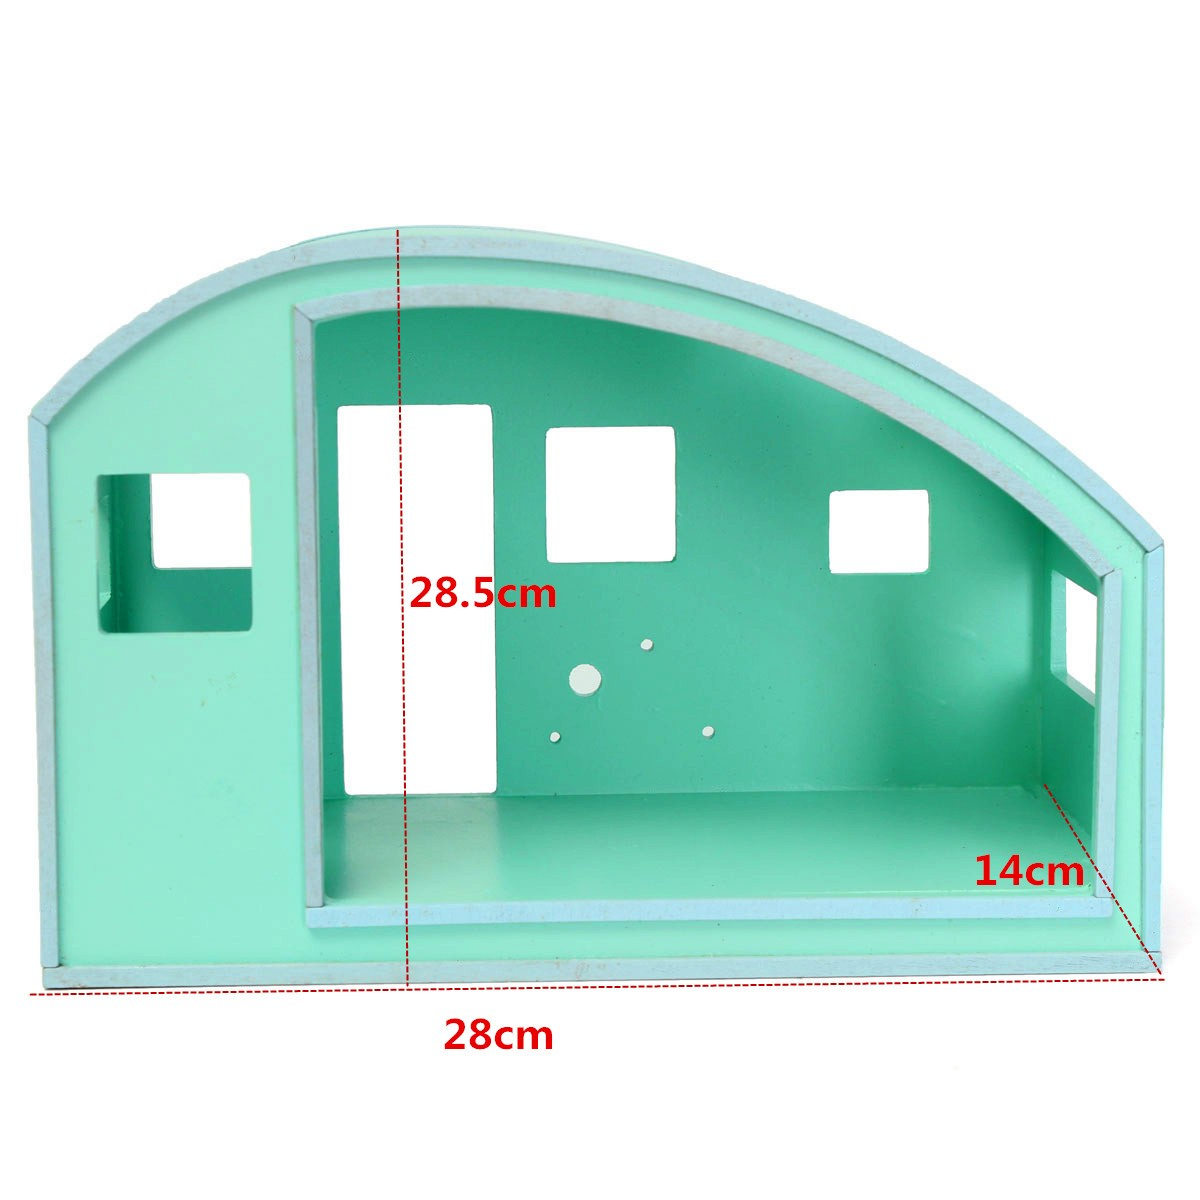 HTB1UQUBN9zqK1RjSZFjq6zlCFXao - Robotime - DIY Models, DIY Miniature Houses, 3d Wooden Puzzle